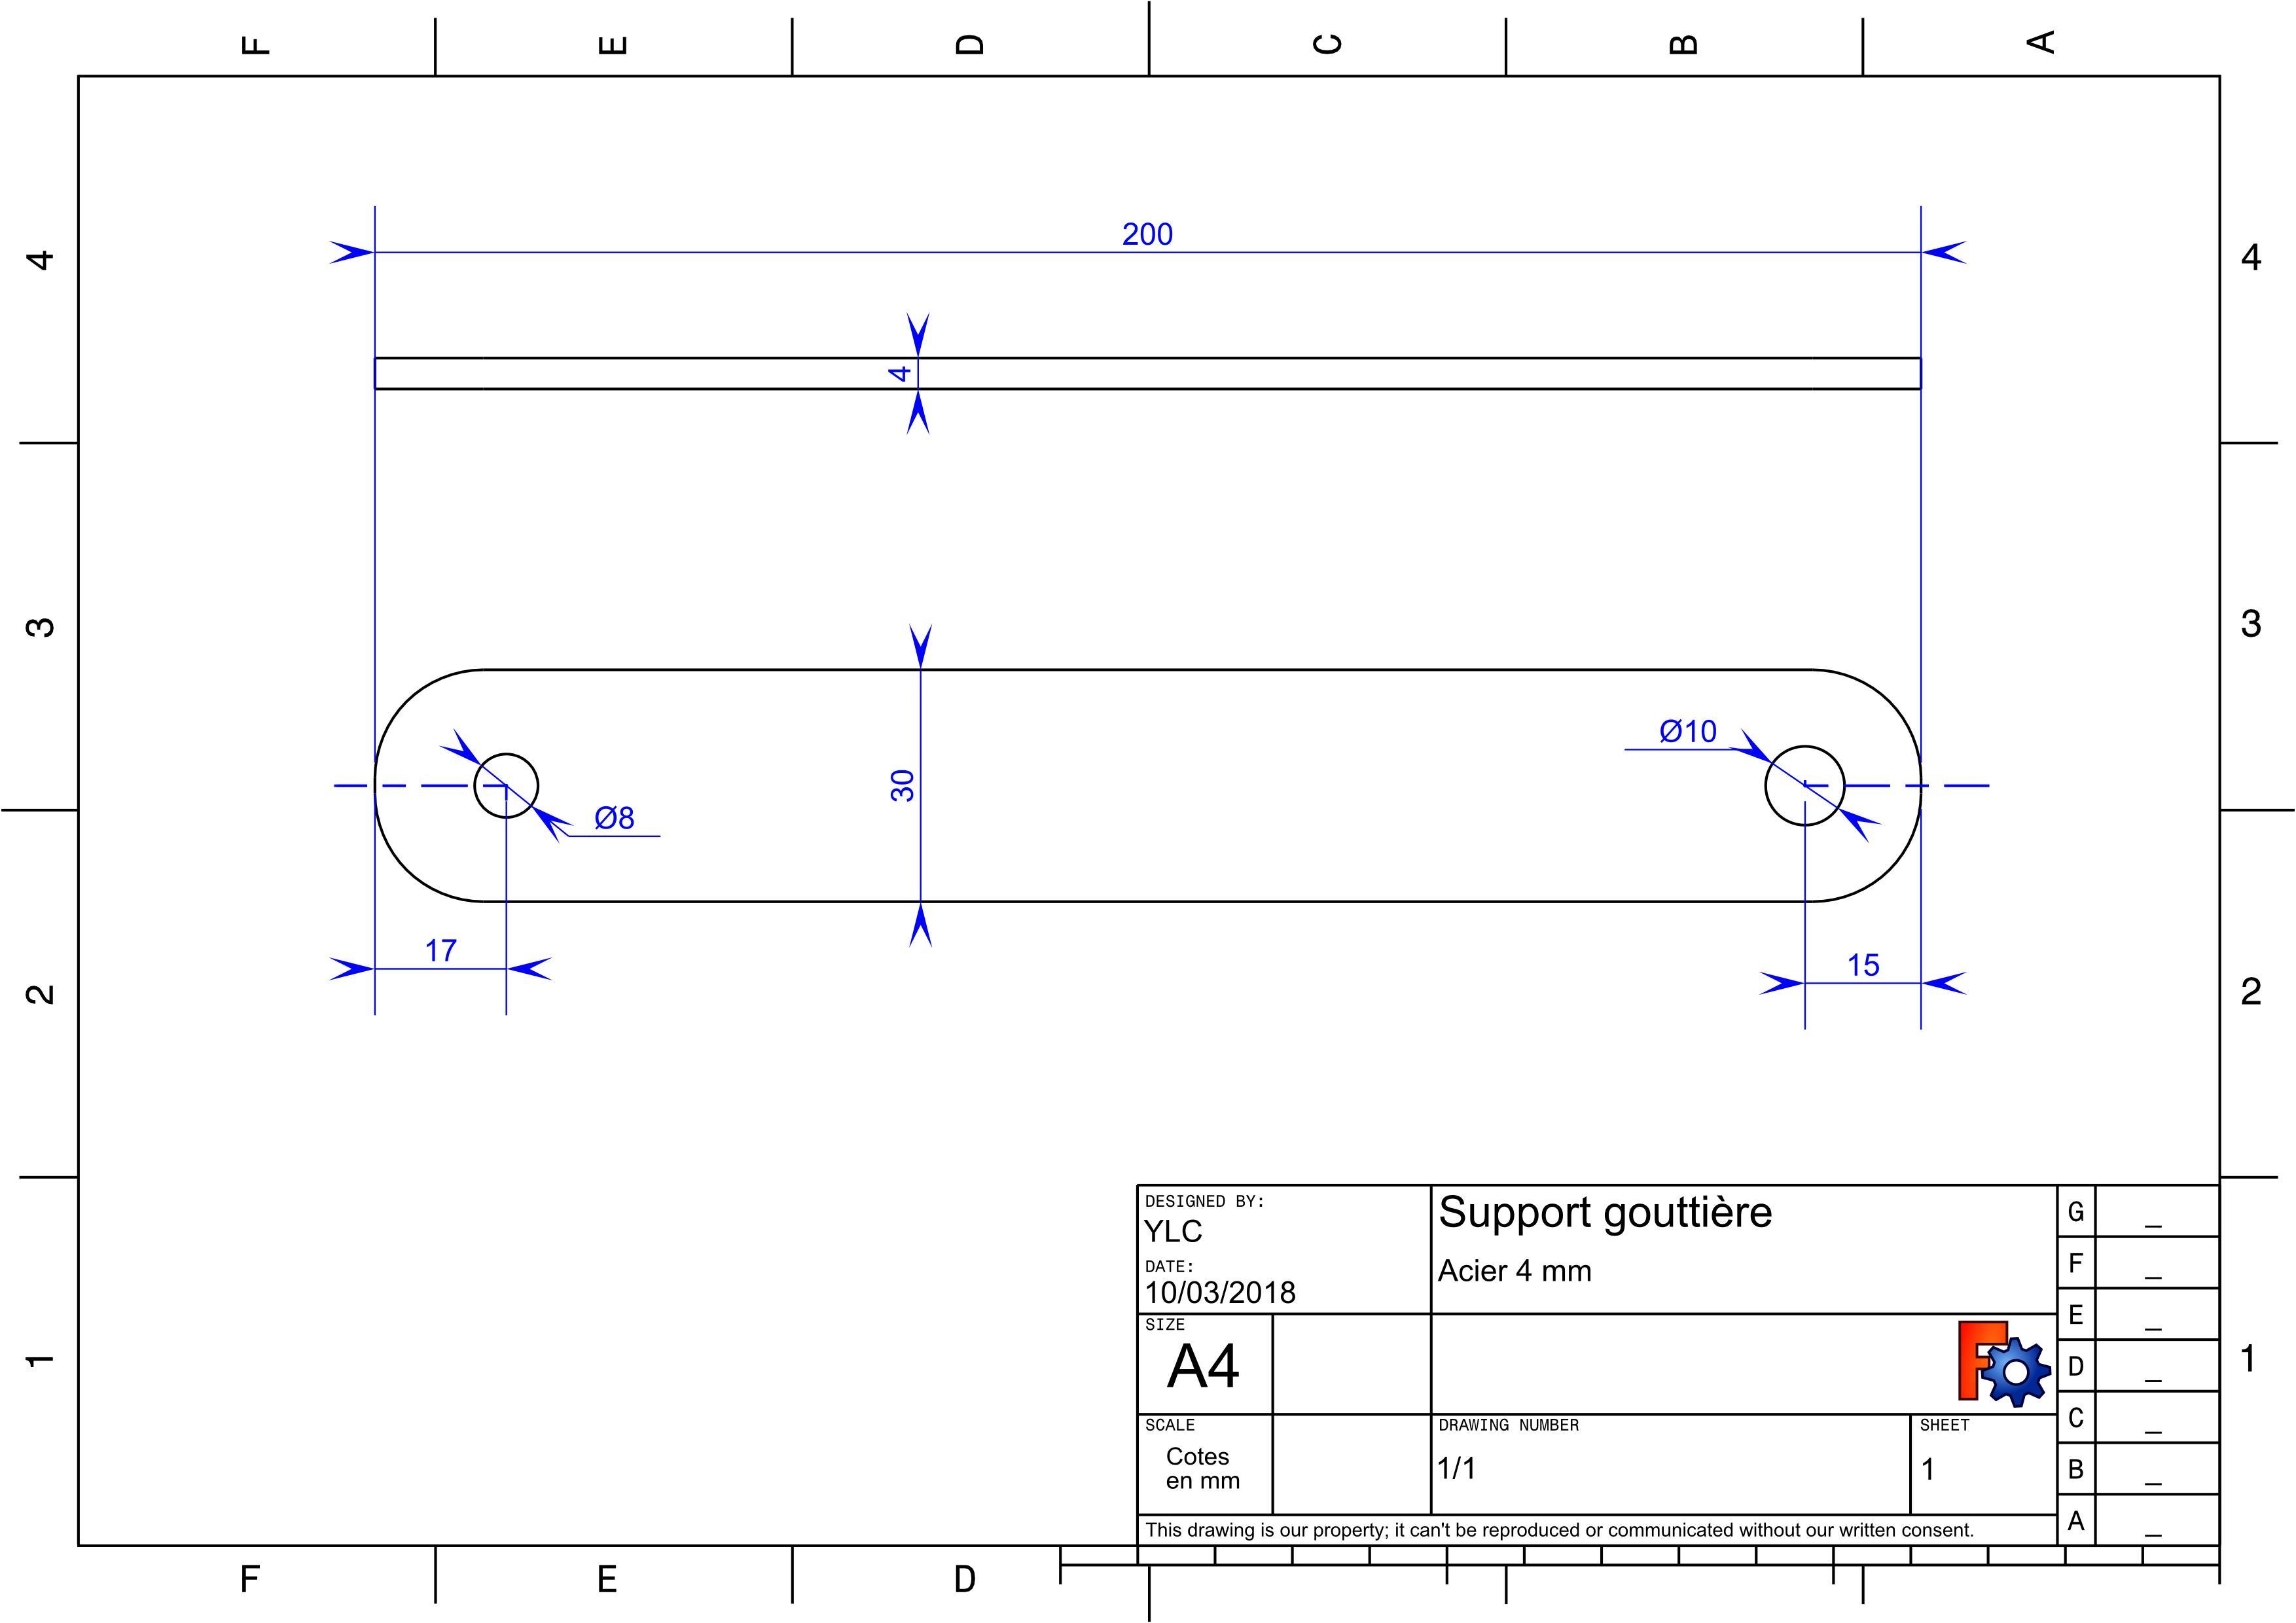 Annexe4 plan pièces metal : Support gouttière.jpg